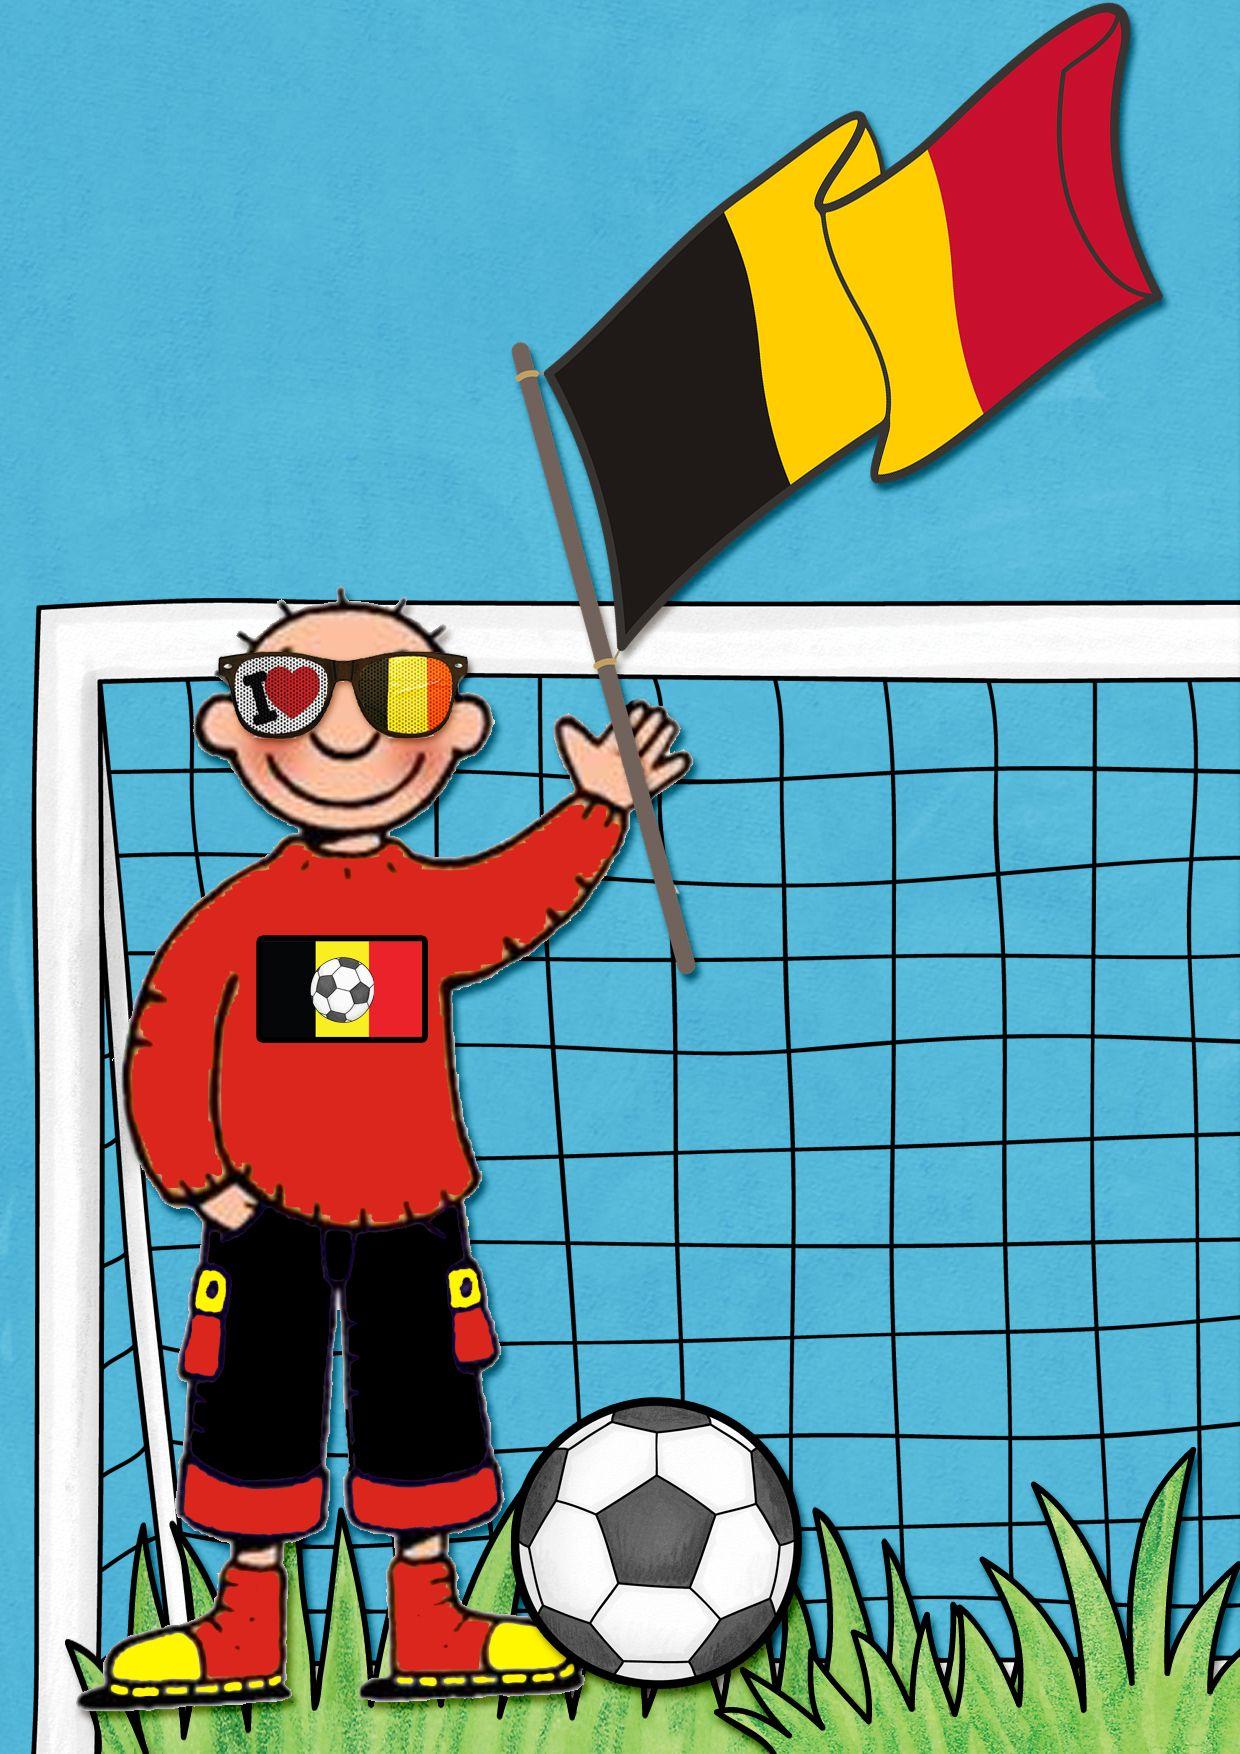 Jules Rode Duivel Voetbal Voetbal Olympische Sport Peuteractiviteit